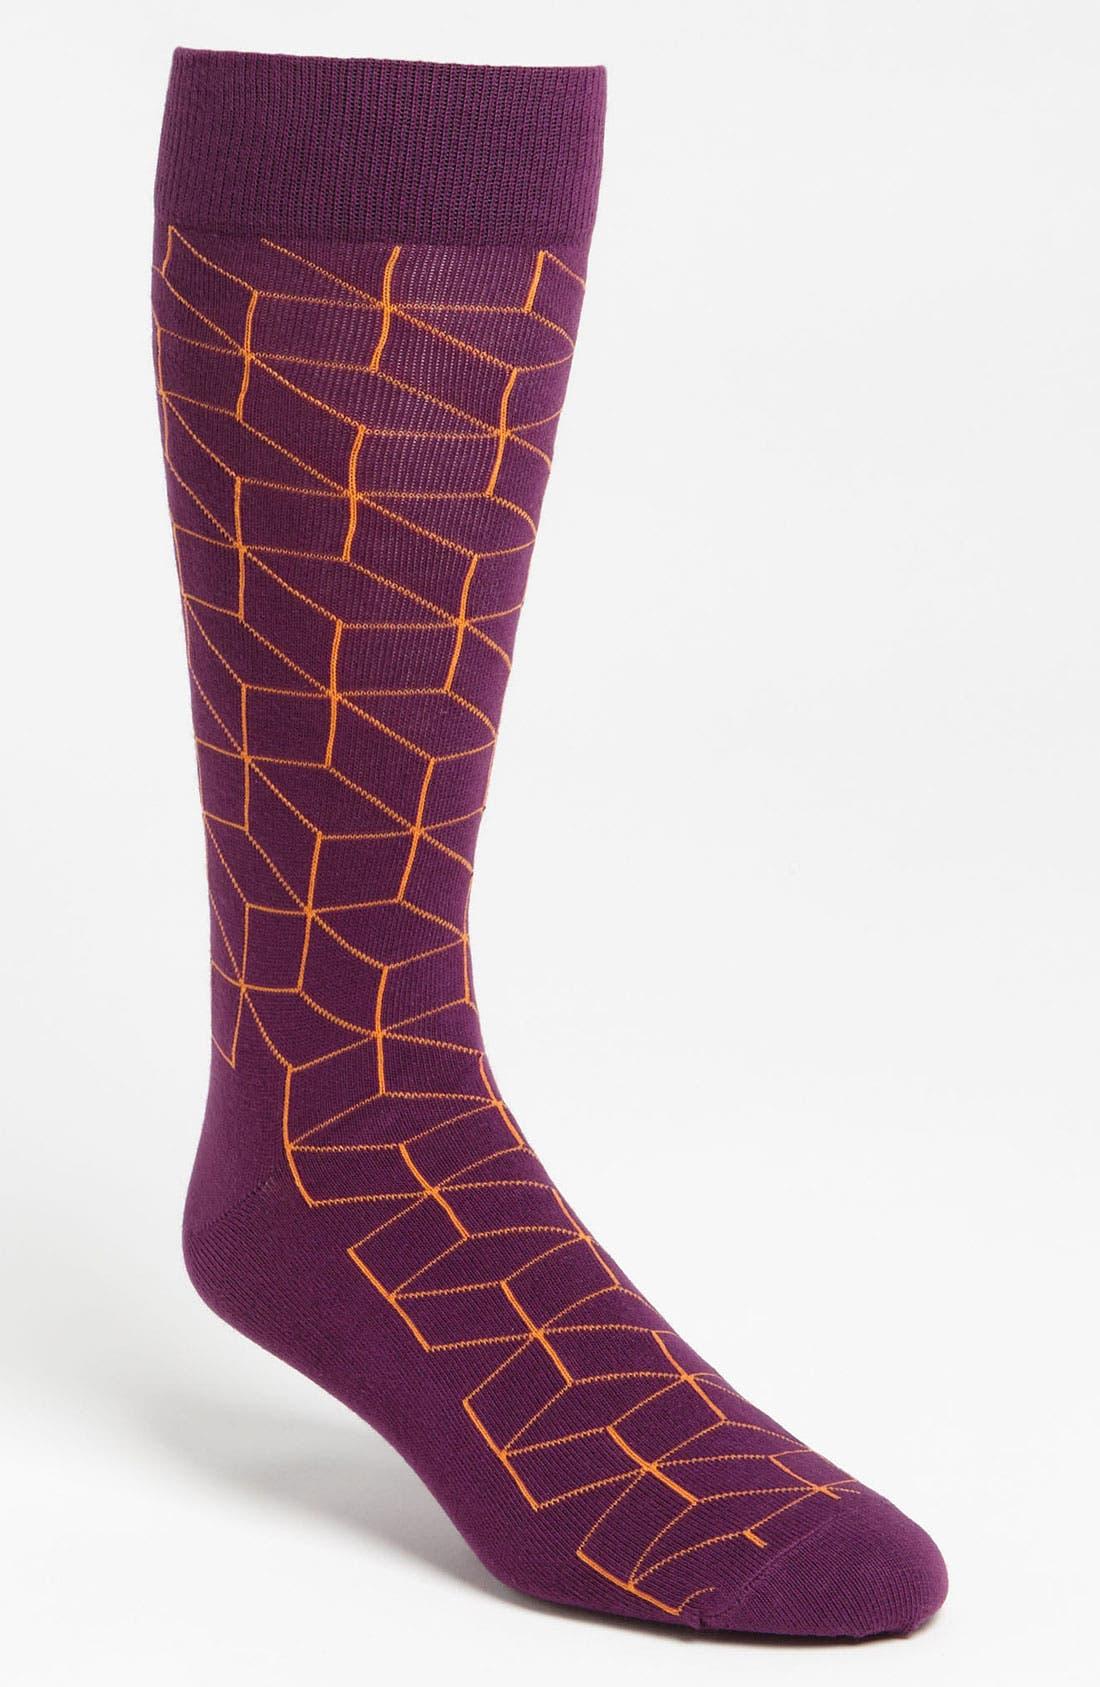 Main Image - Happy Socks 'Optic' Socks